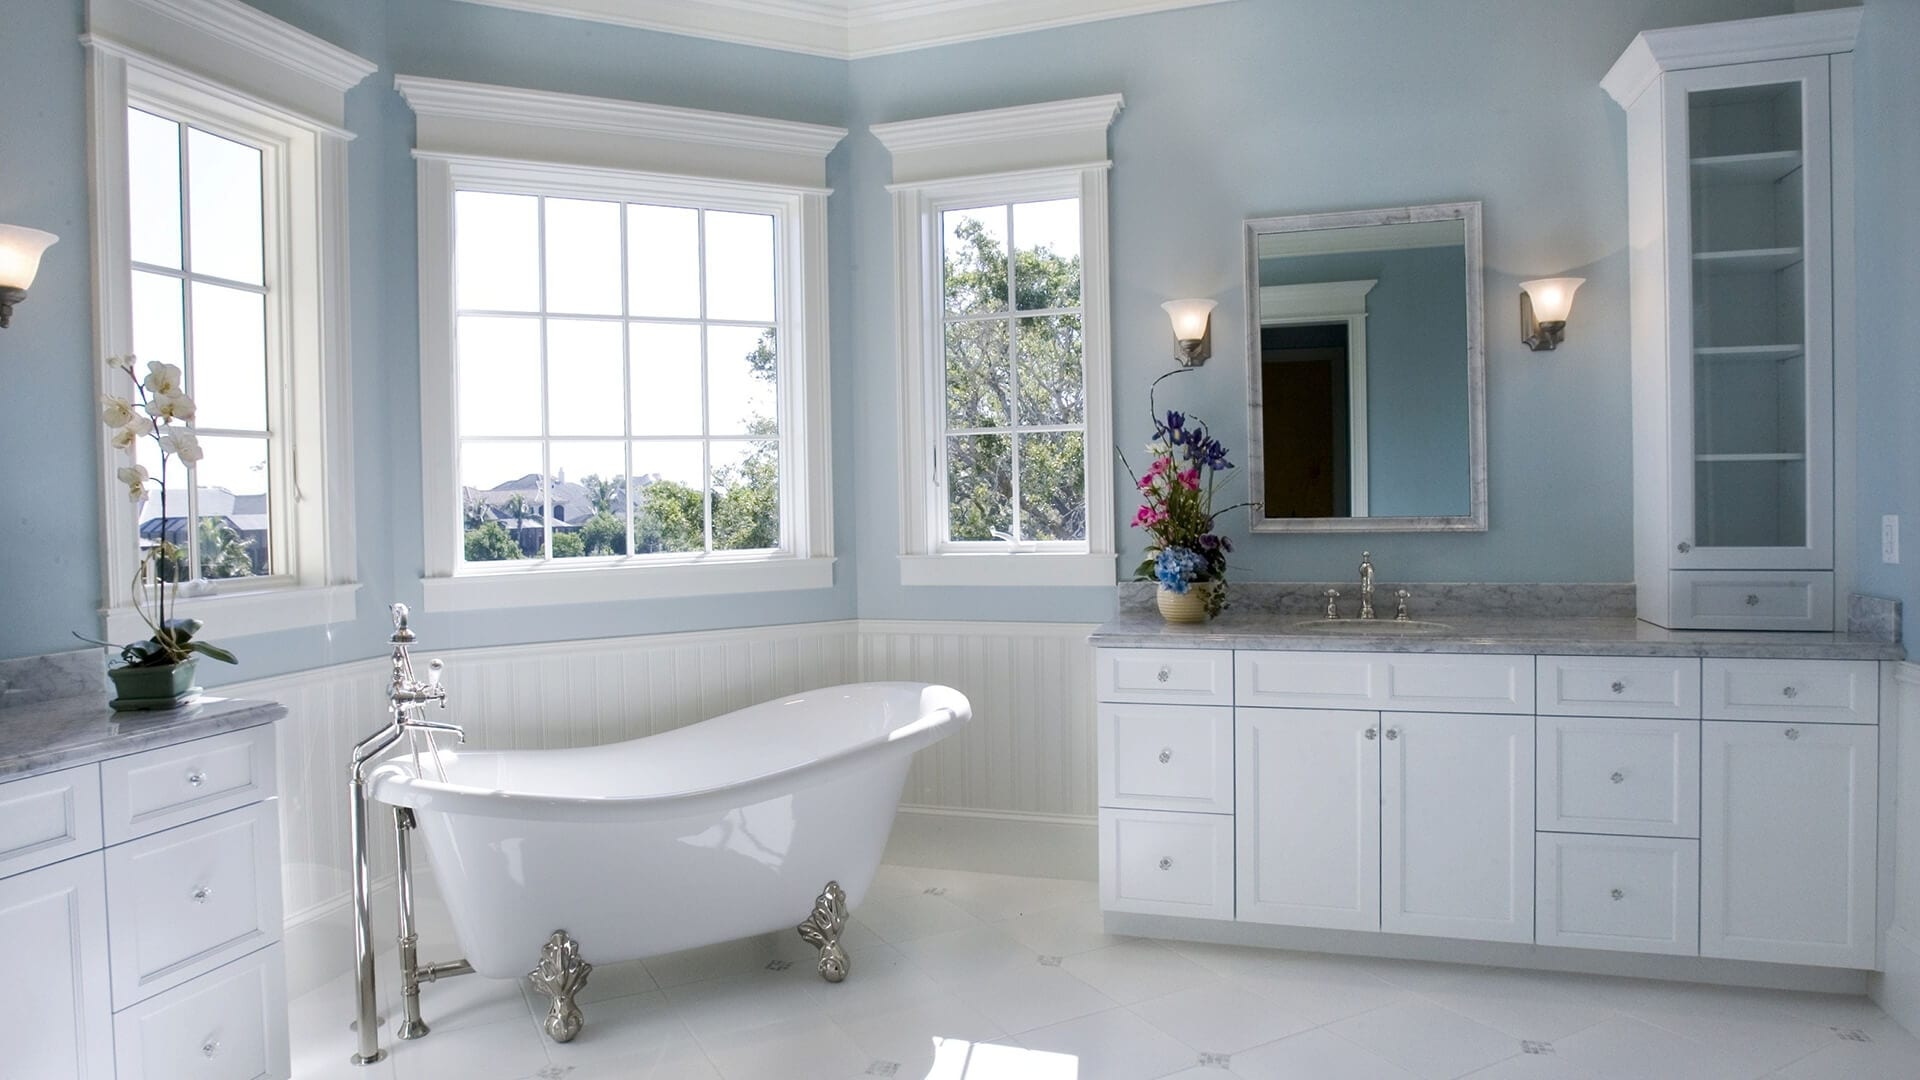 wash room and windows